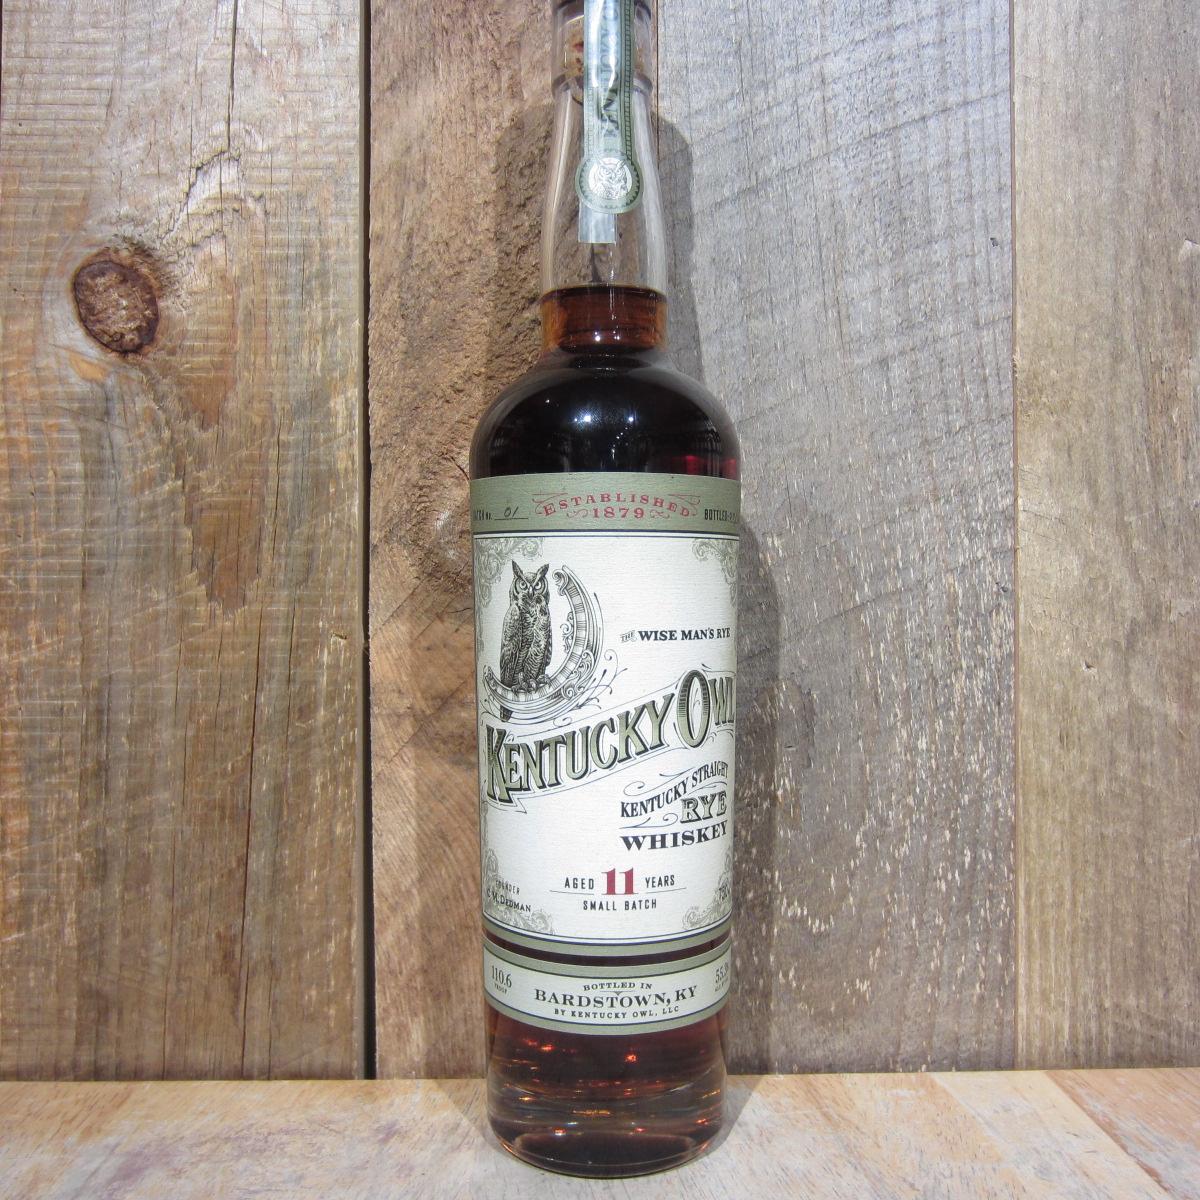 Kentucky Owl Straight Rye Whiskey 11yr Batch 2 750ml